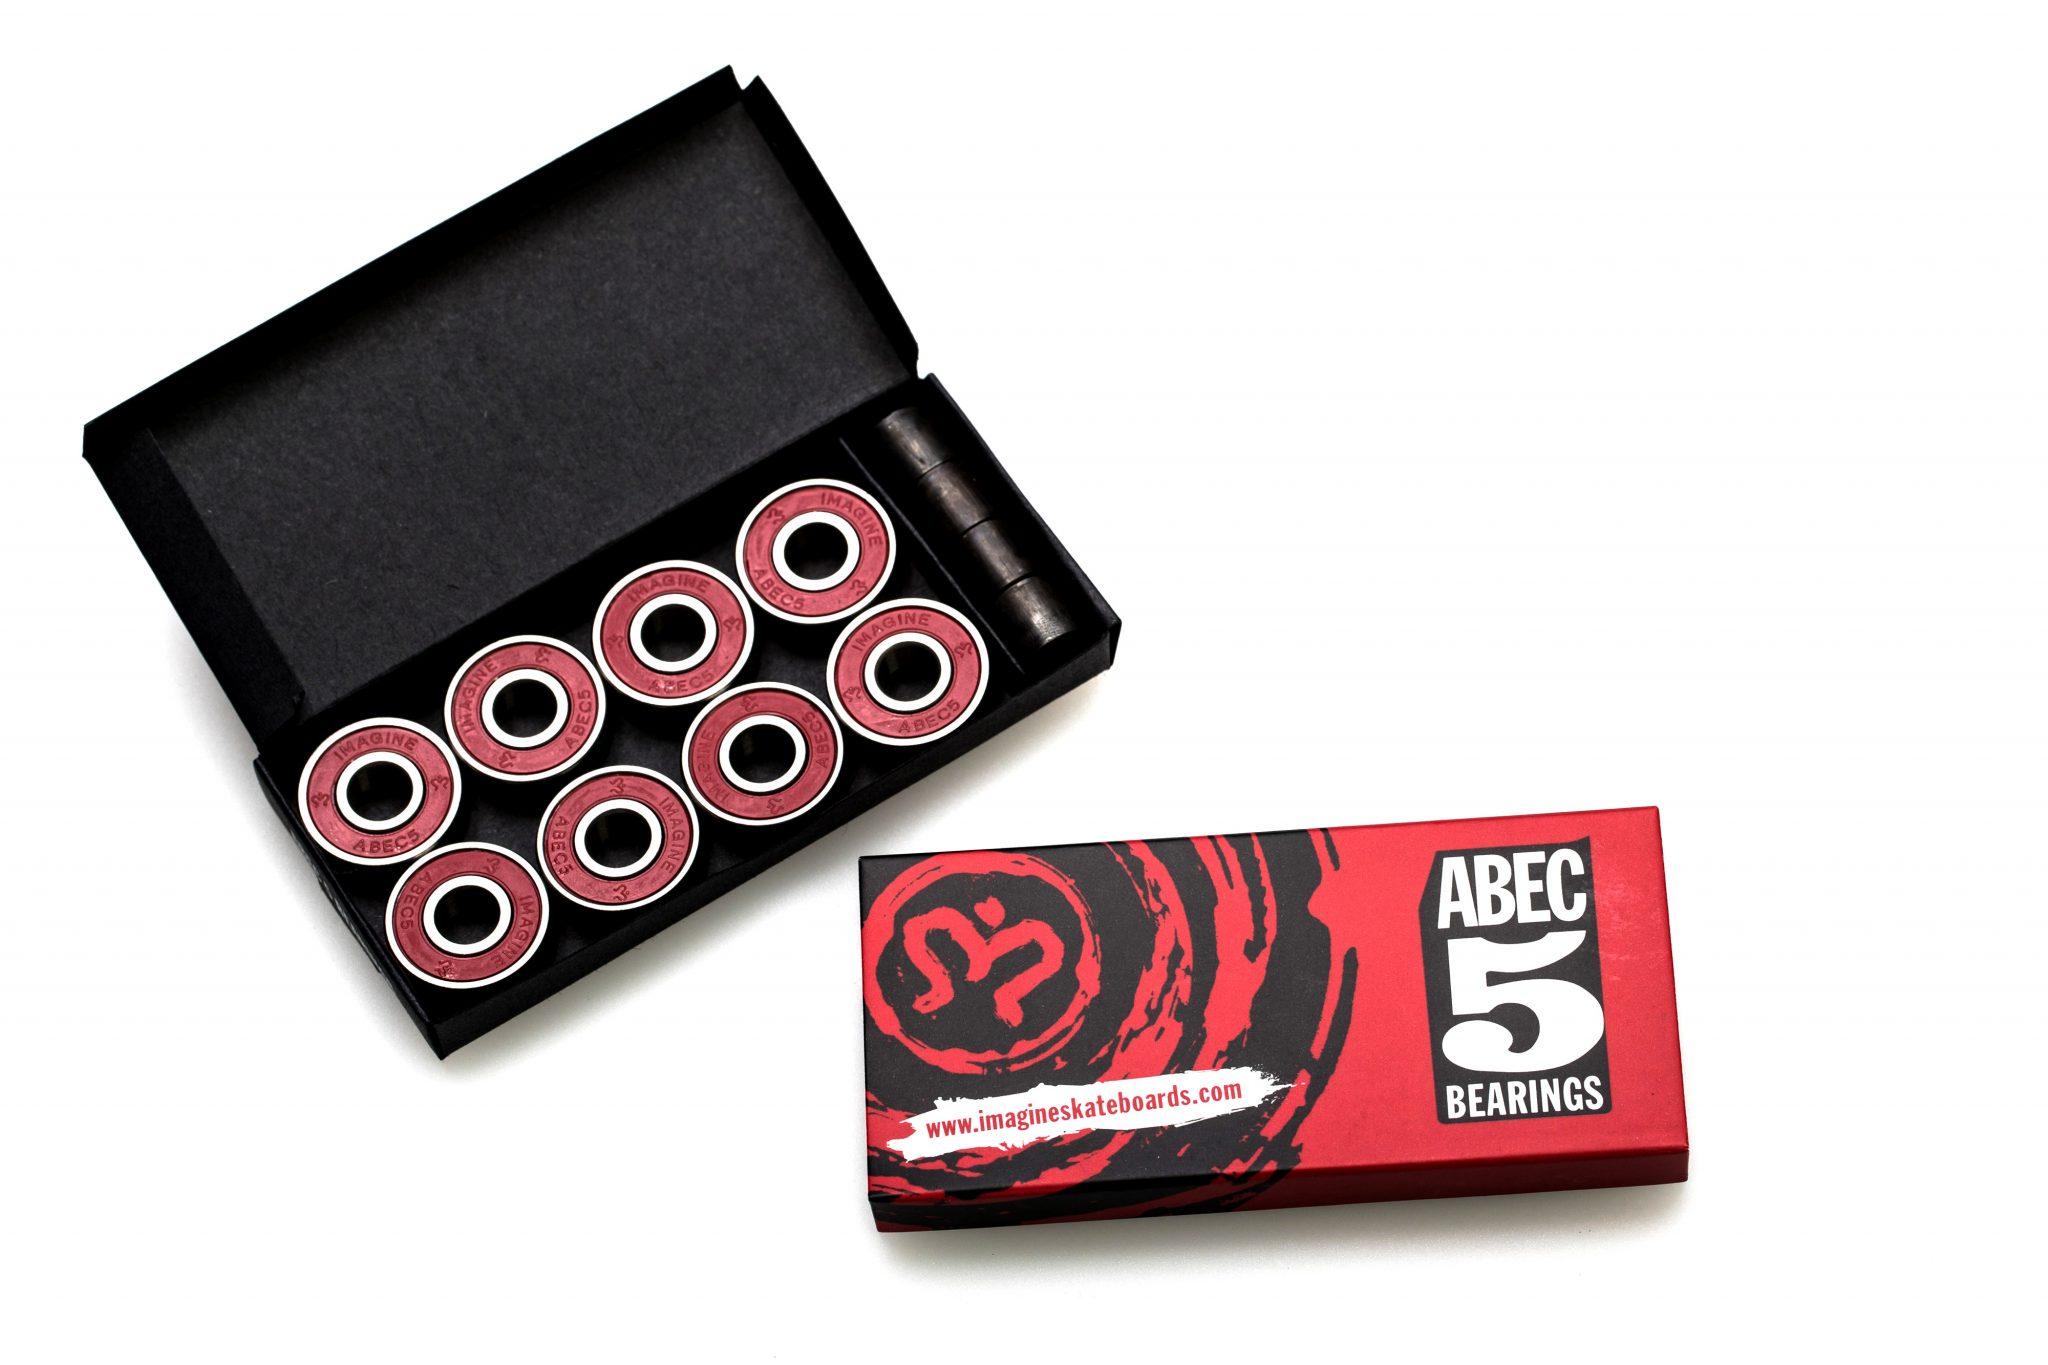 ABEC 5 Bearings - Imagine Skateboards